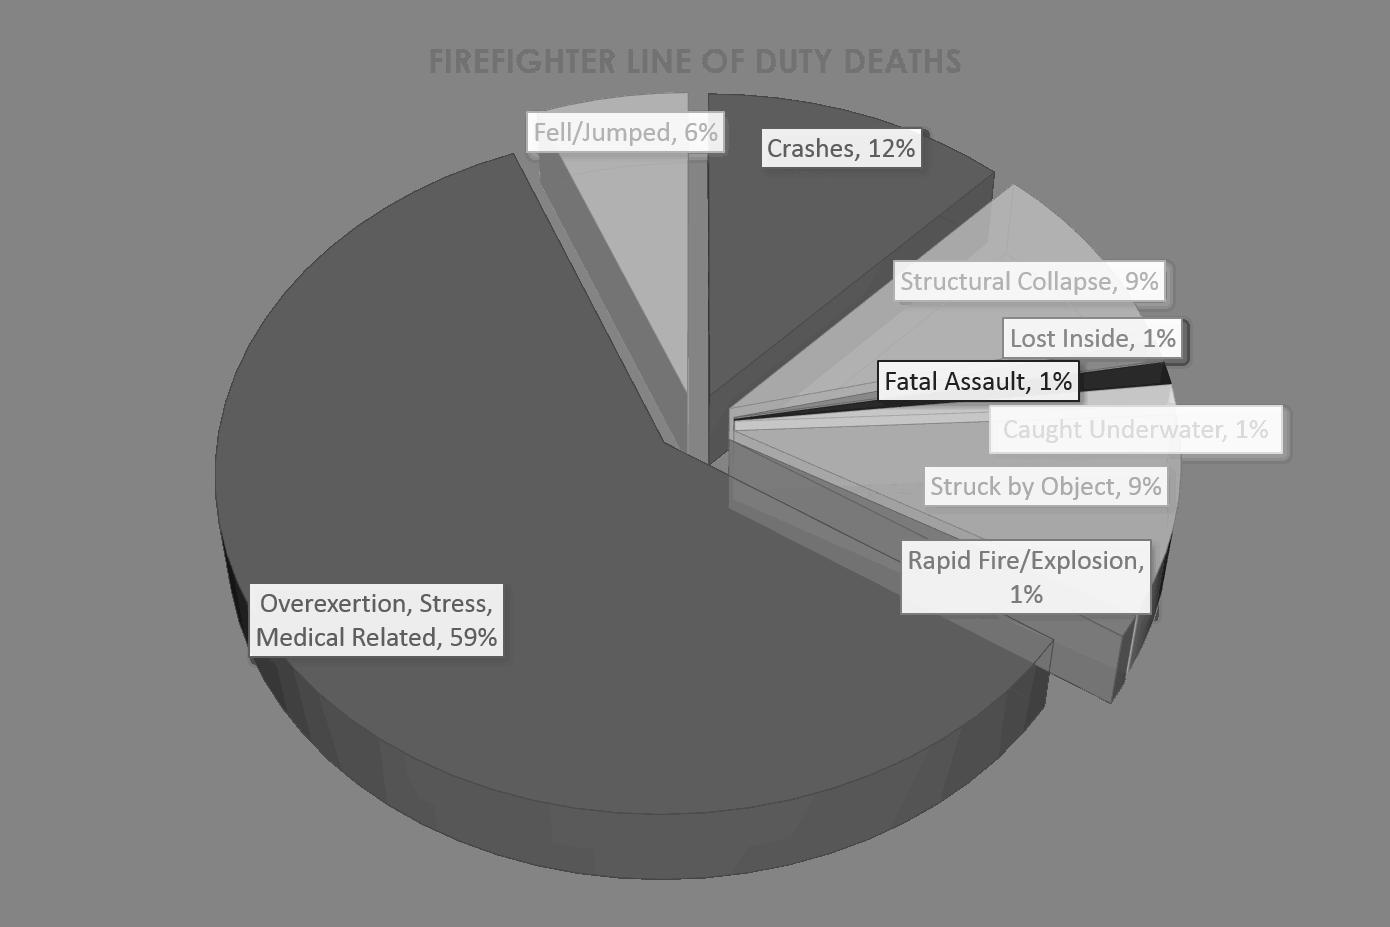 "Fahy, Rita F.  ""U.S. Firefighter Injuries - 2014"" NFPA. NFPA, June 2016. Web. 1 8 2016   http://www.nfpa.org/~/media/files/research/nfpa-reports/fire-service-statistics/osfff.pdf?la=en"